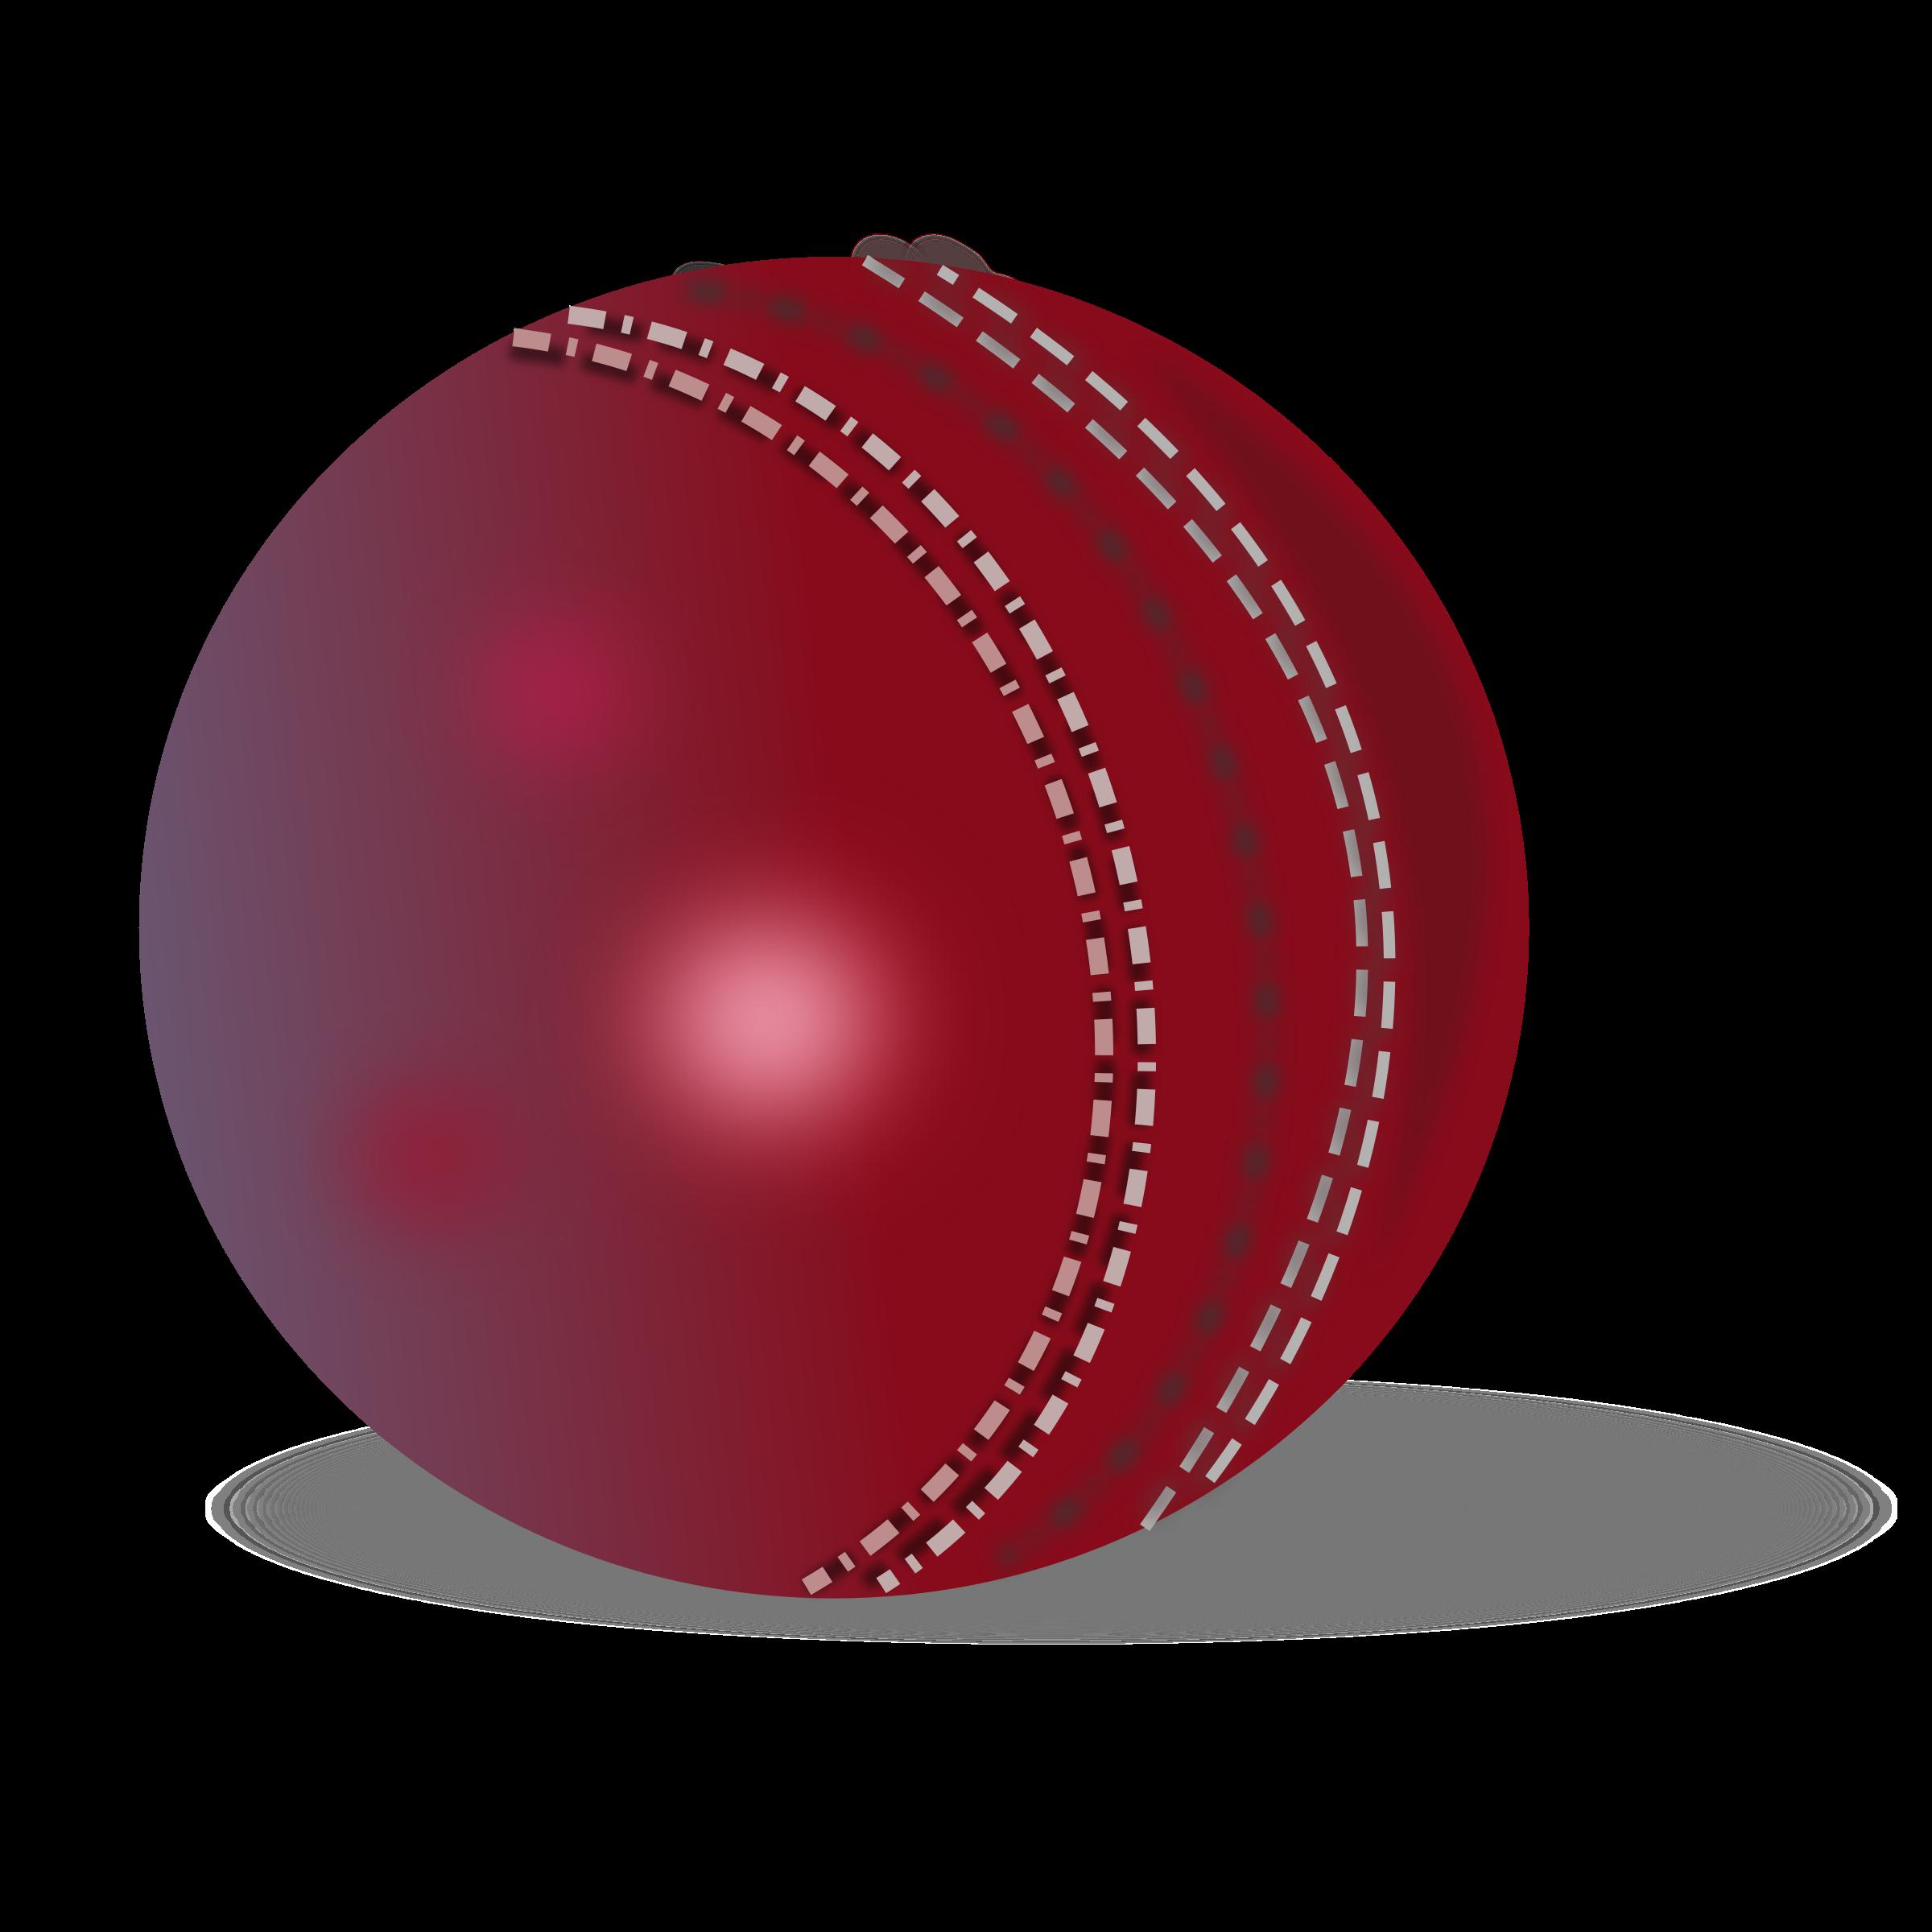 Sphere clipart cricket ball Clipart icon icon ball ball